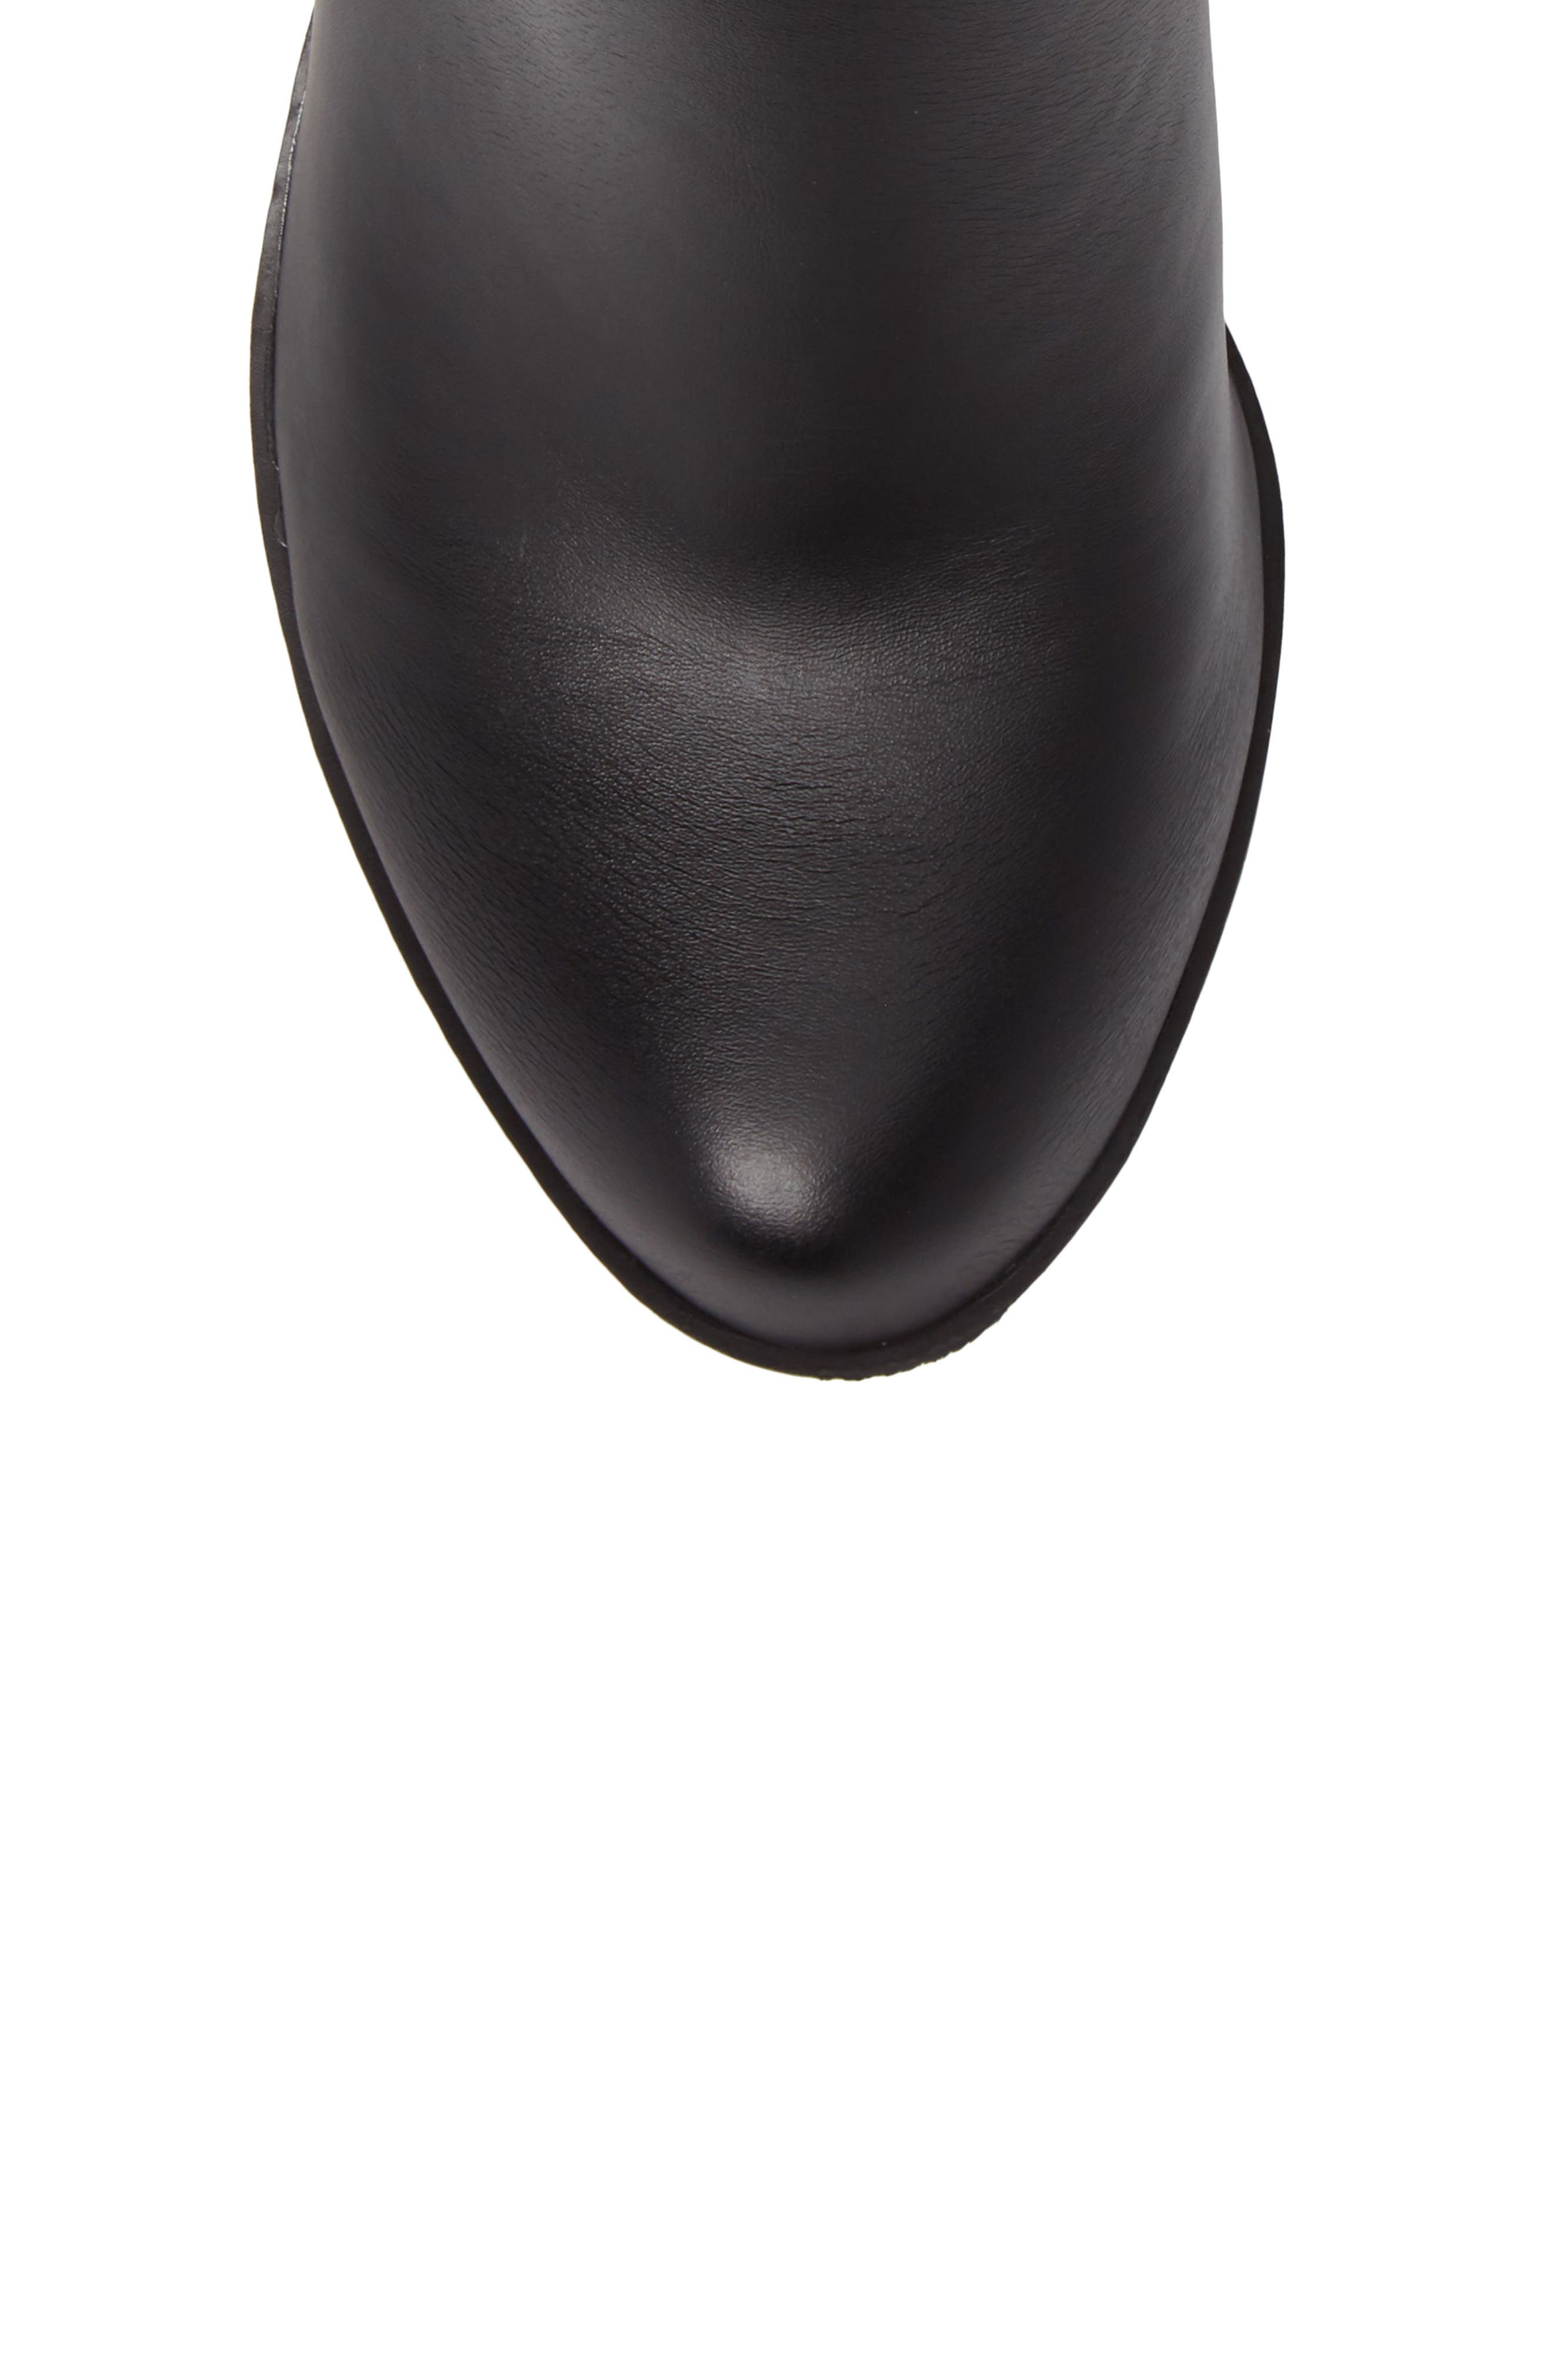 Bartalino Zipper Edged Bootie,                             Alternate thumbnail 5, color,                             BLACK